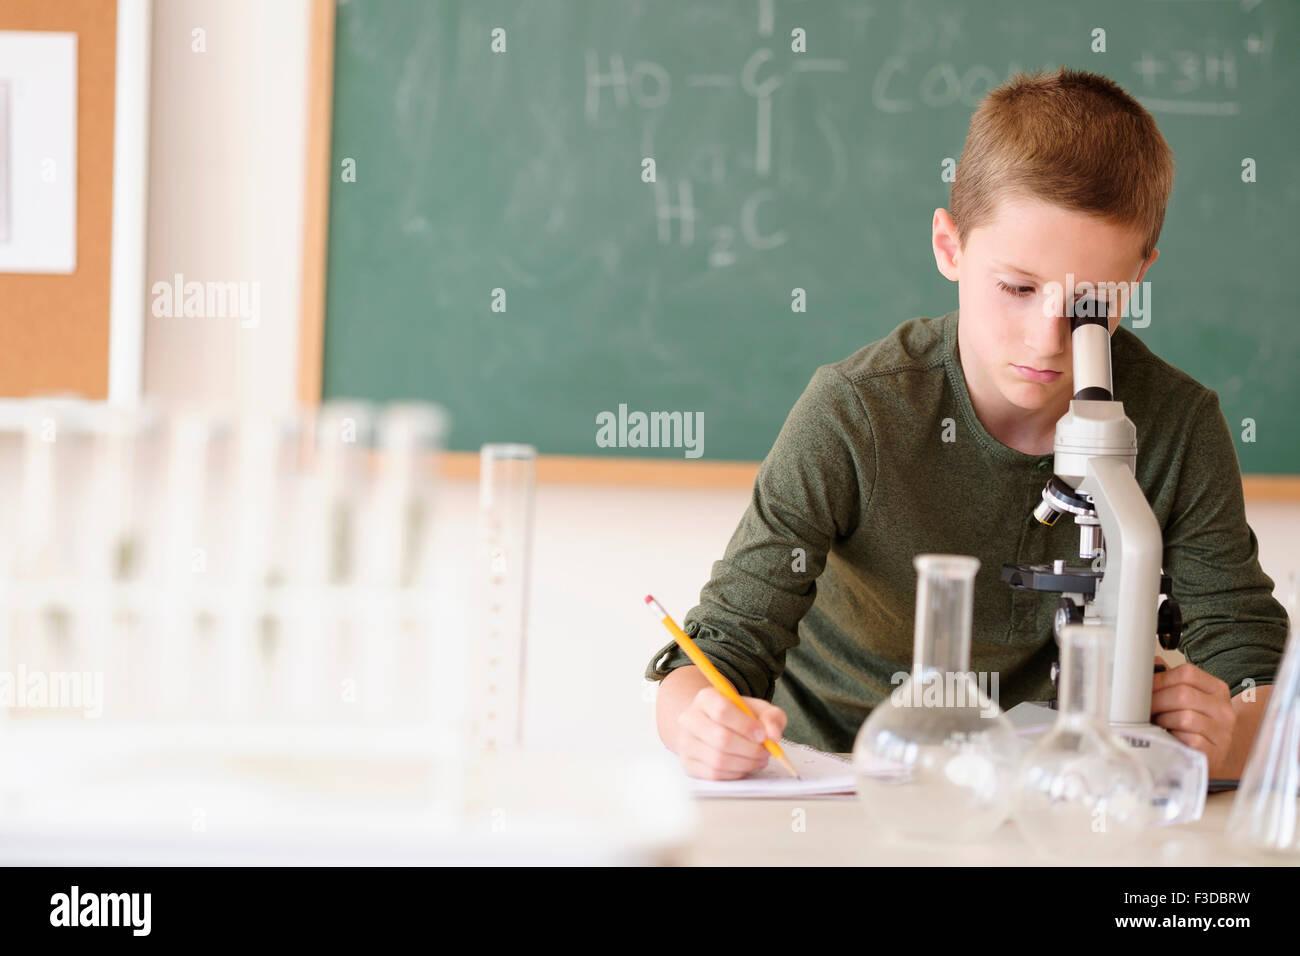 Boy (8-9) looking through microscope - Stock Image